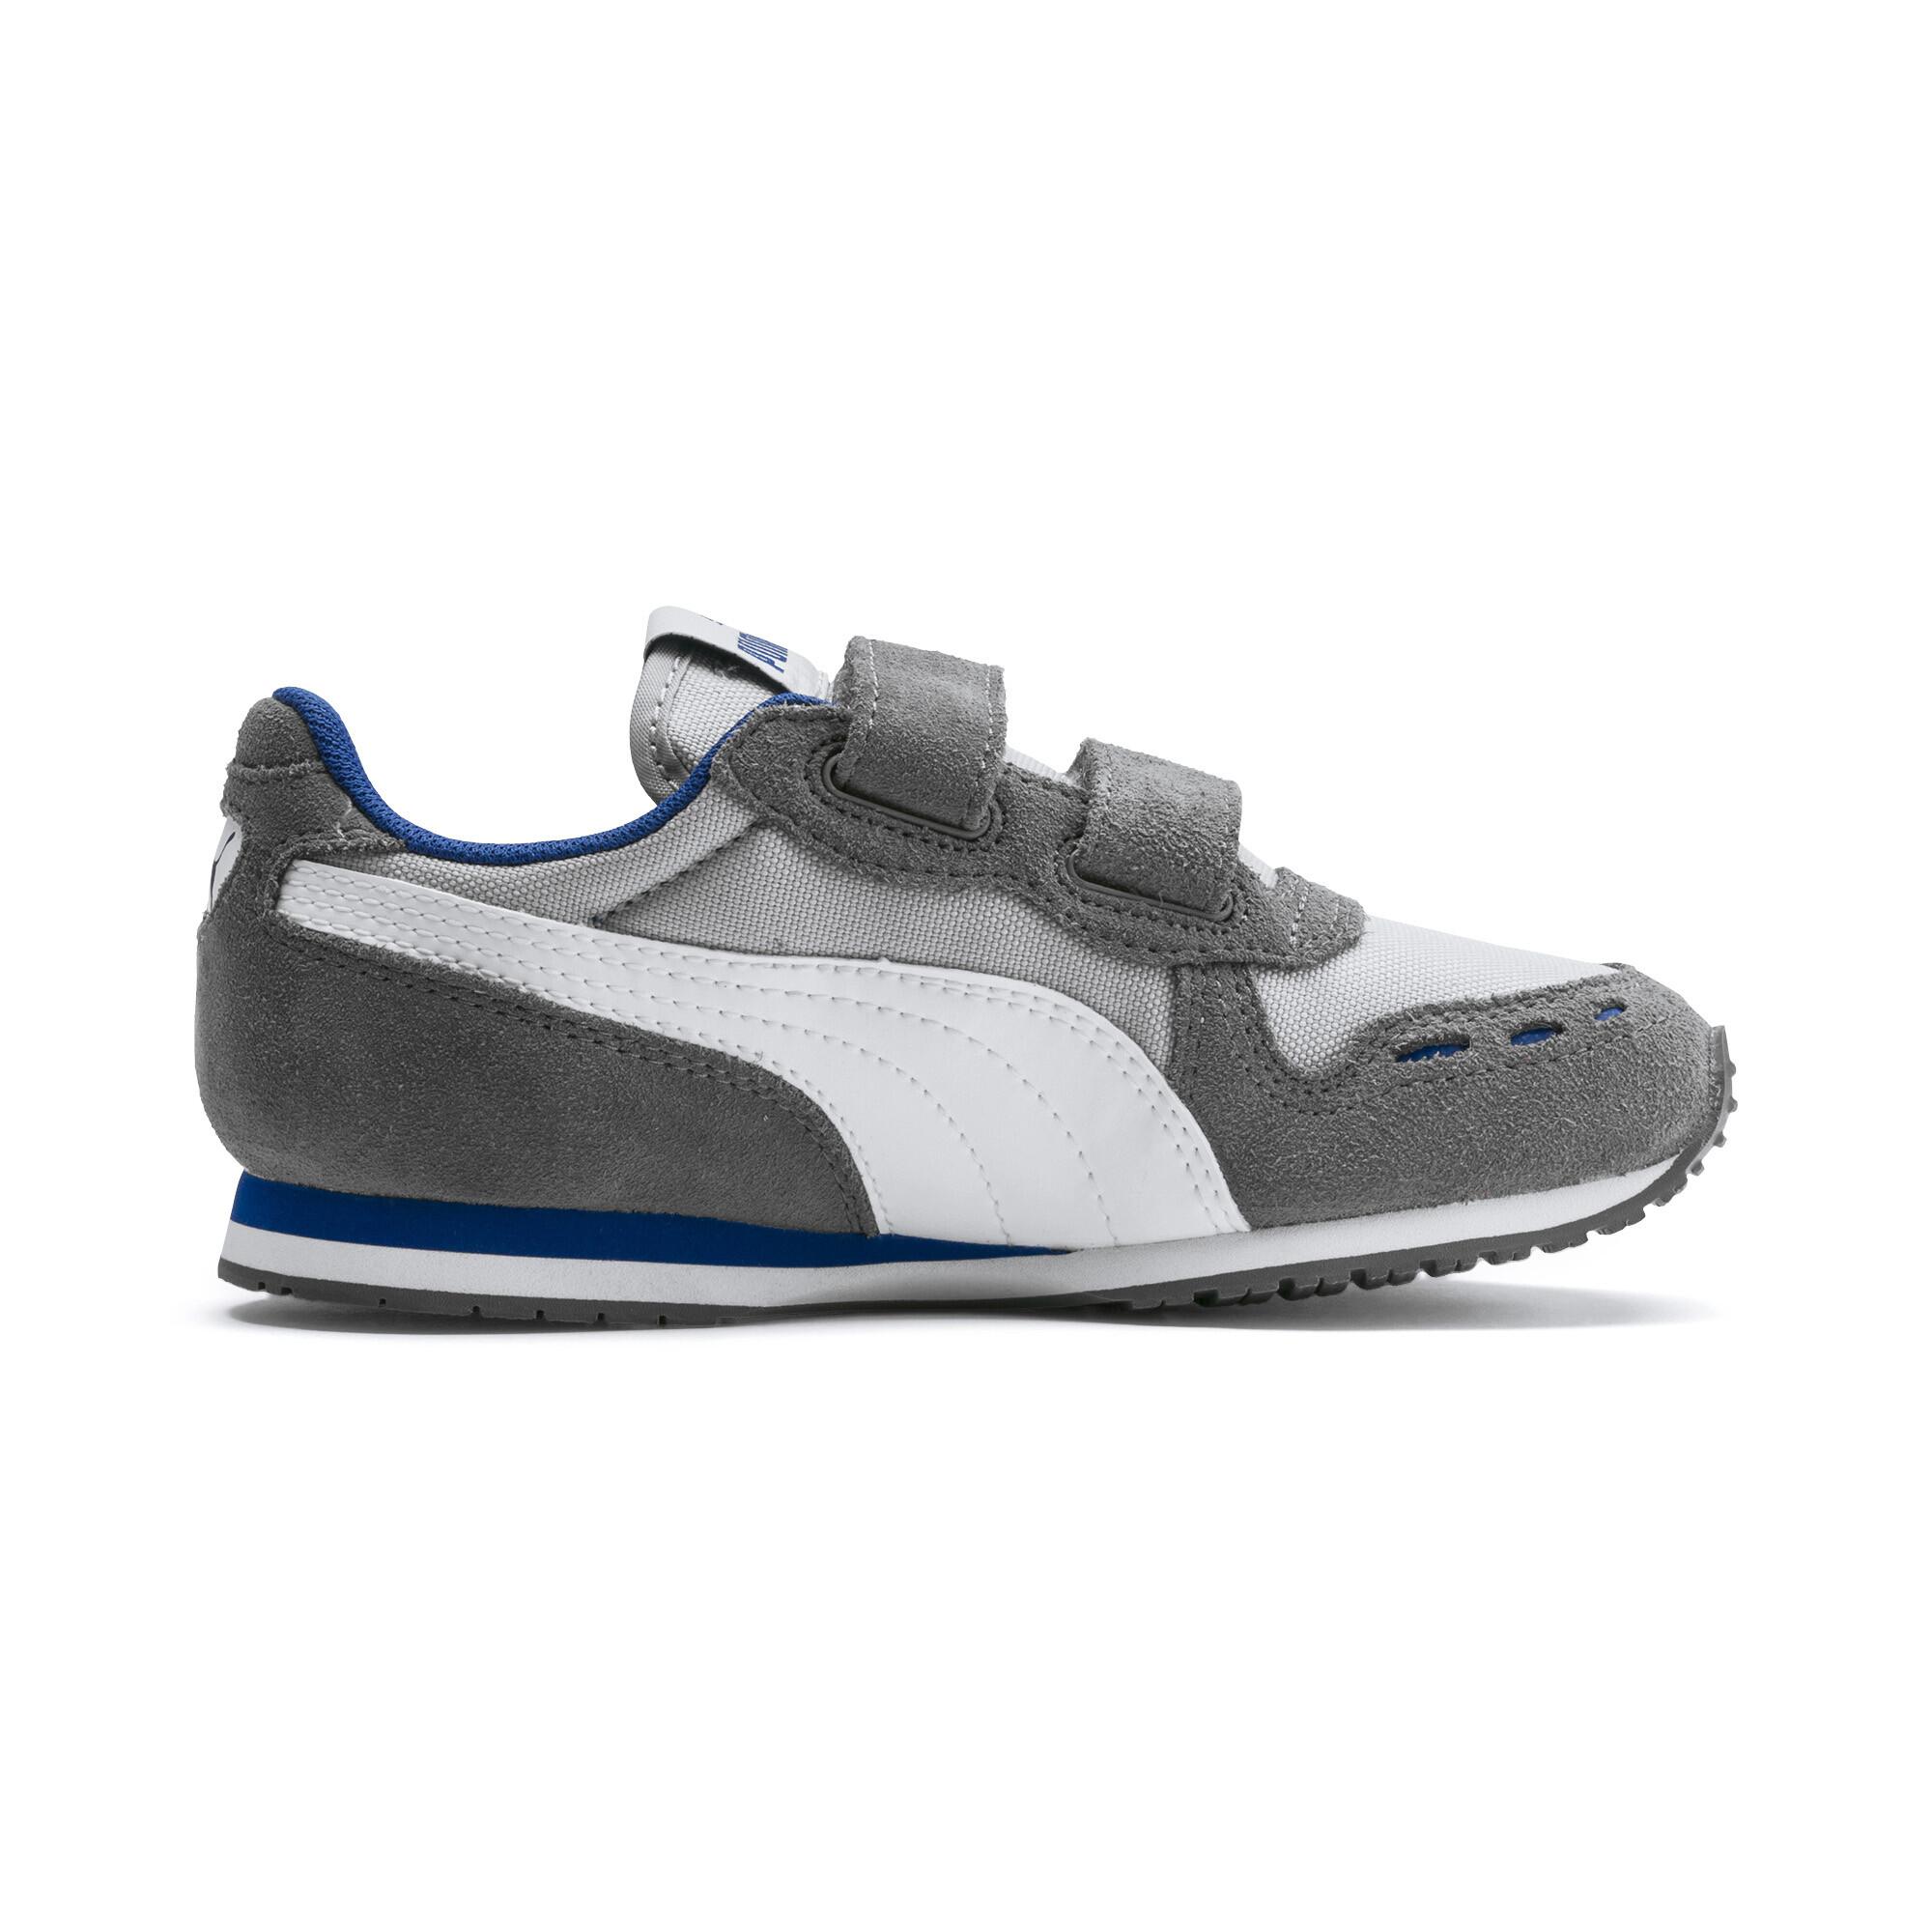 PUMA-Cabana-Racer-Little-Kids-039-Shoes-Kids-Shoe-Kids thumbnail 12